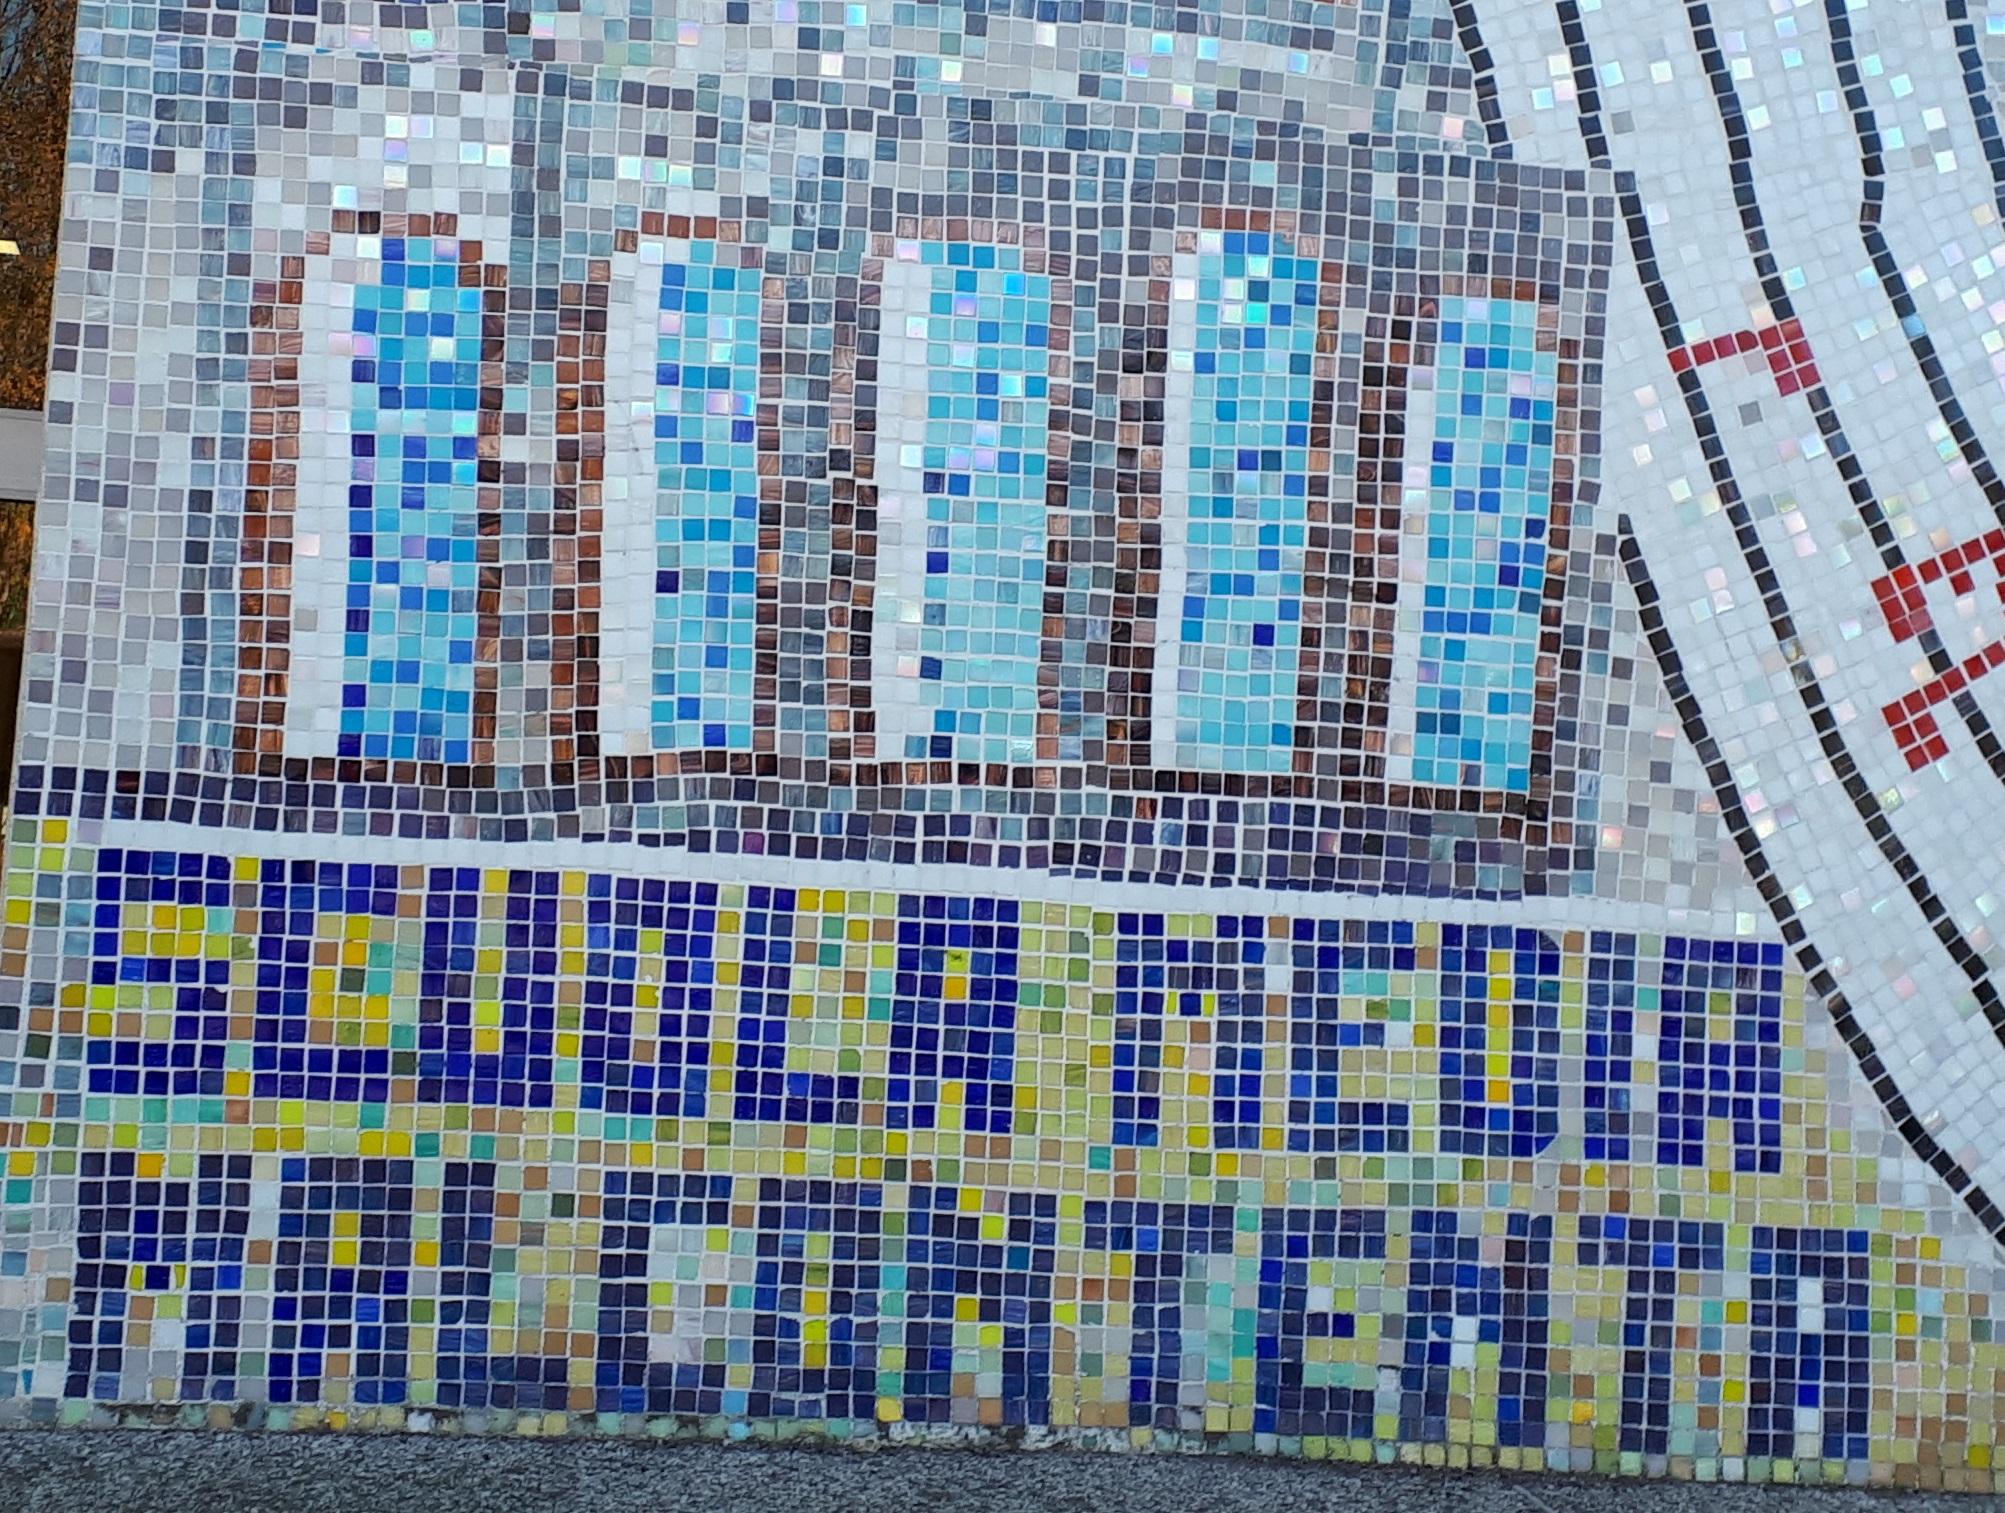 Malcontenta mosaico